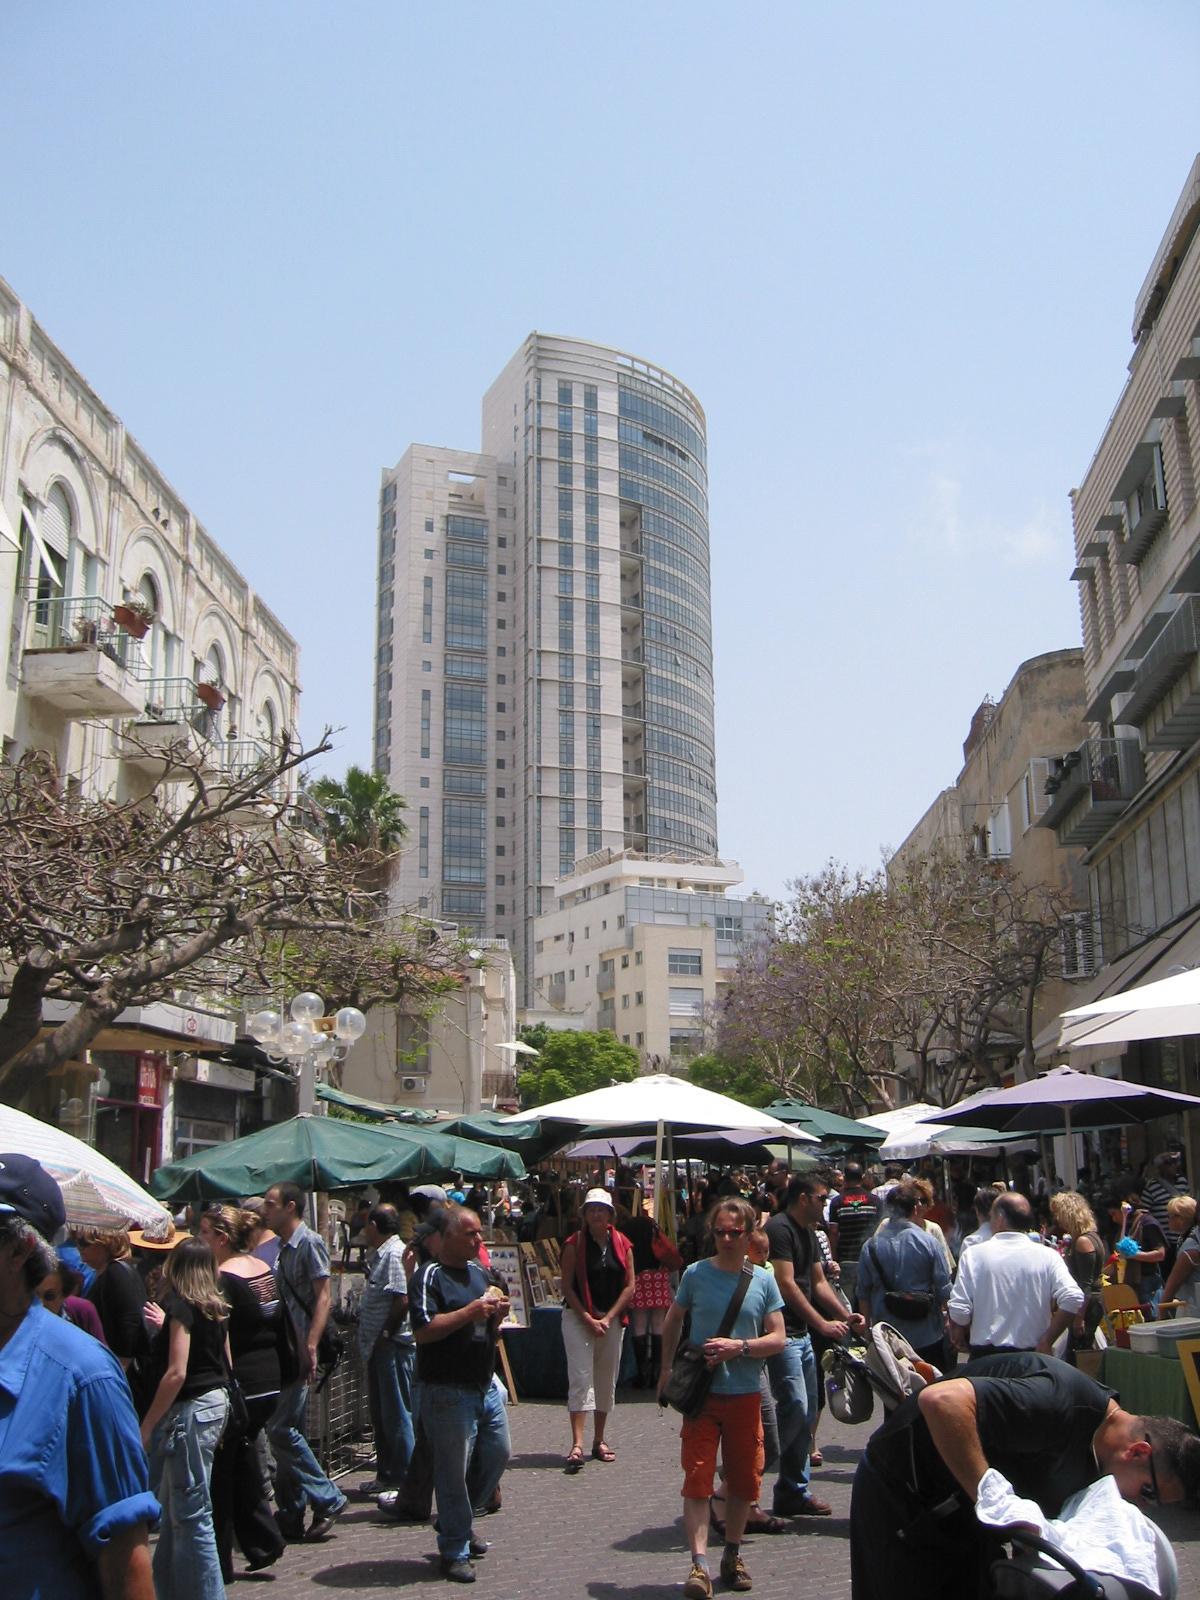 Click photo to download. Caption: Nahalat Binyamin Street in Ron Huldai's city, Tel Aviv. Credit: Sambach/Wikimedia Commons.